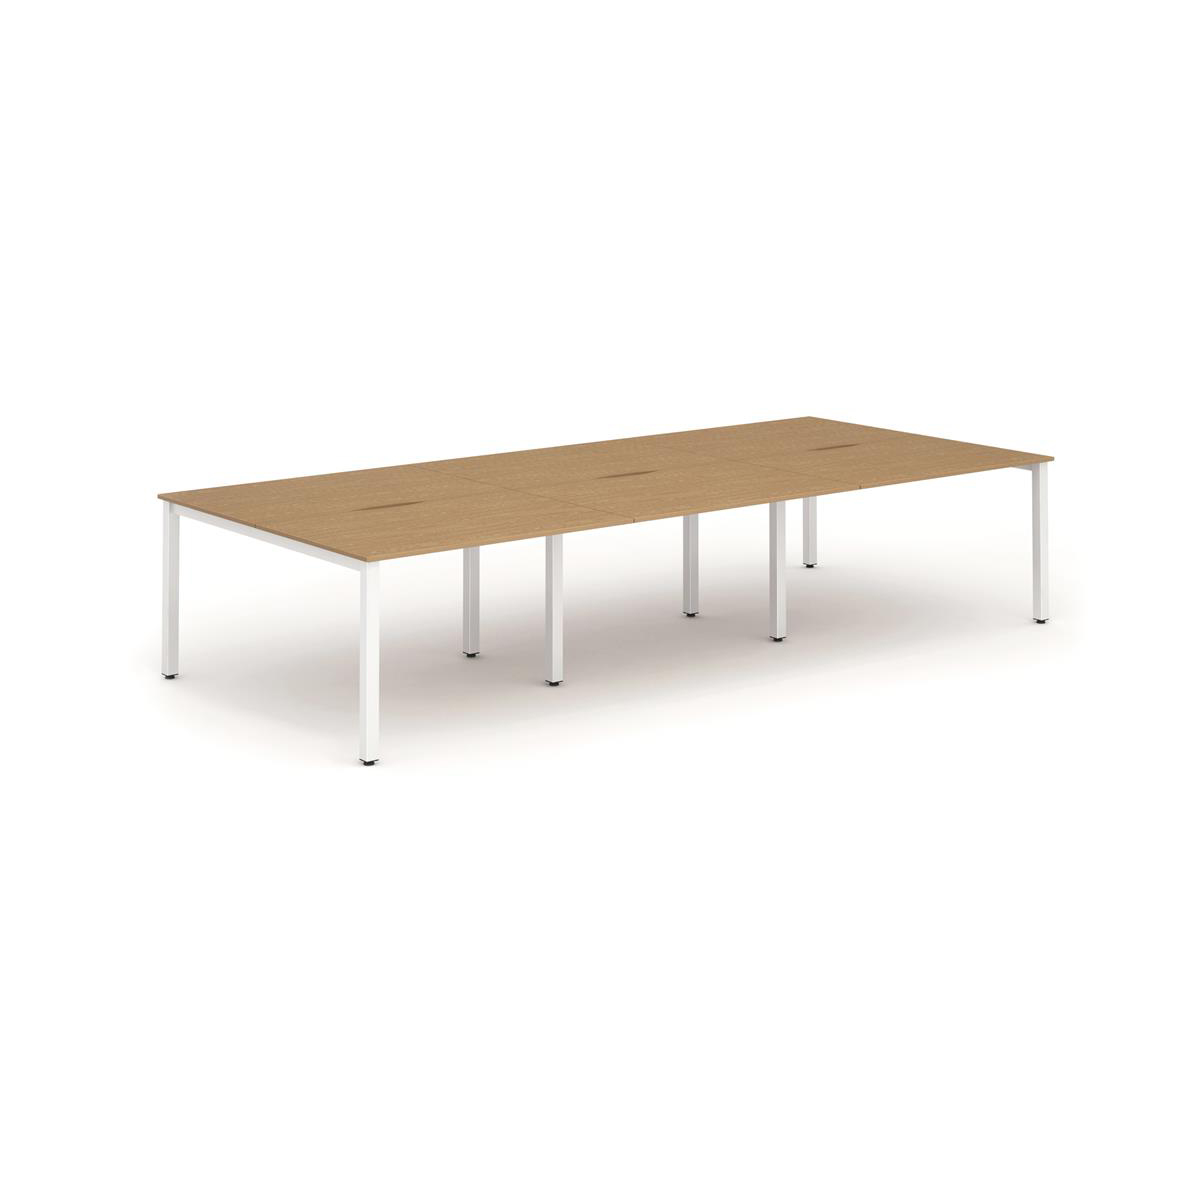 Trexus Bench Desk 6 Person Back to Back Configuration White Leg 2800x1600mm Oak Ref BE273